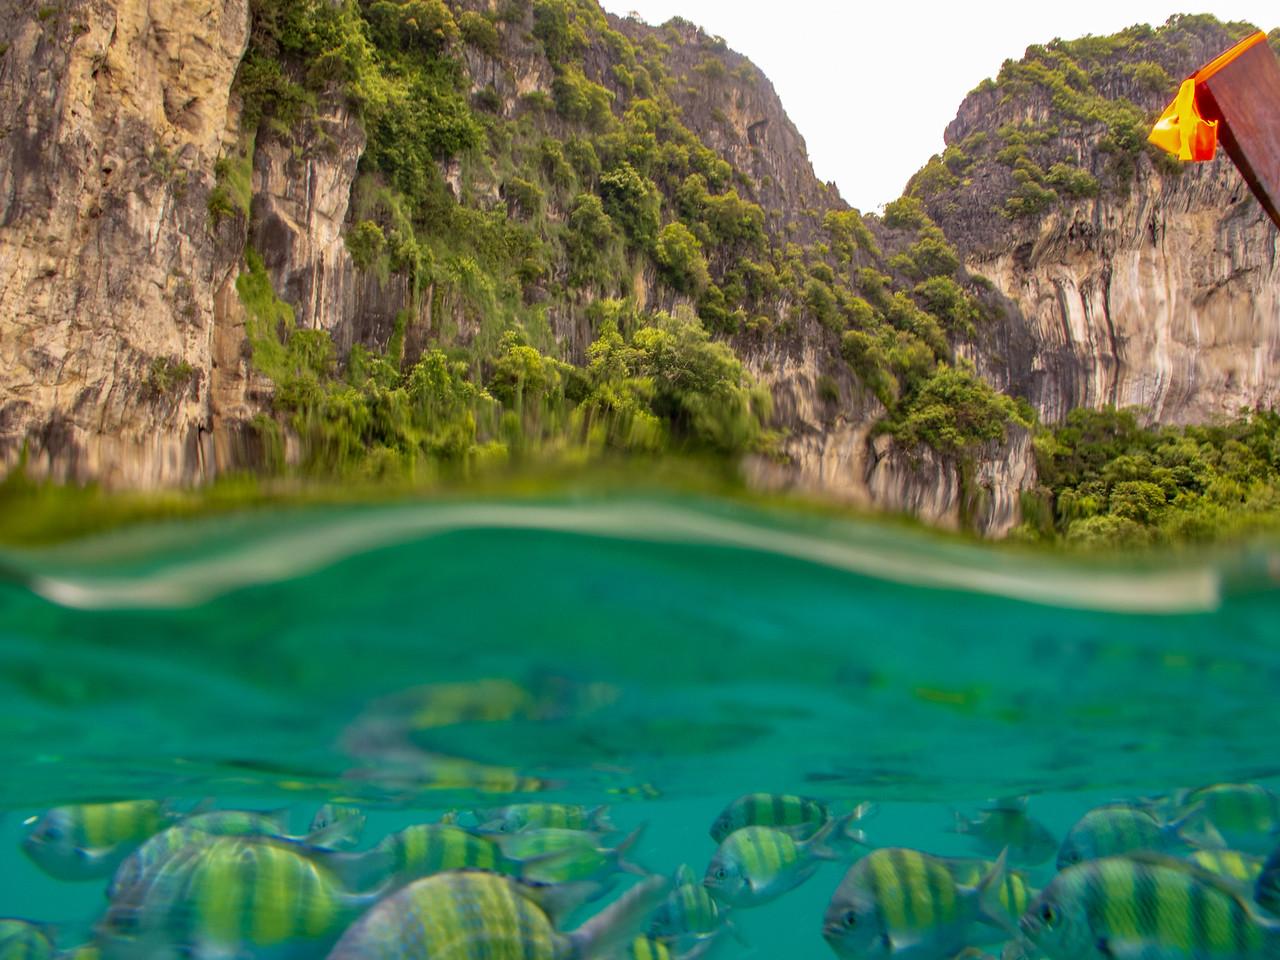 Sea Life Underwater in the Phi Phi Islands